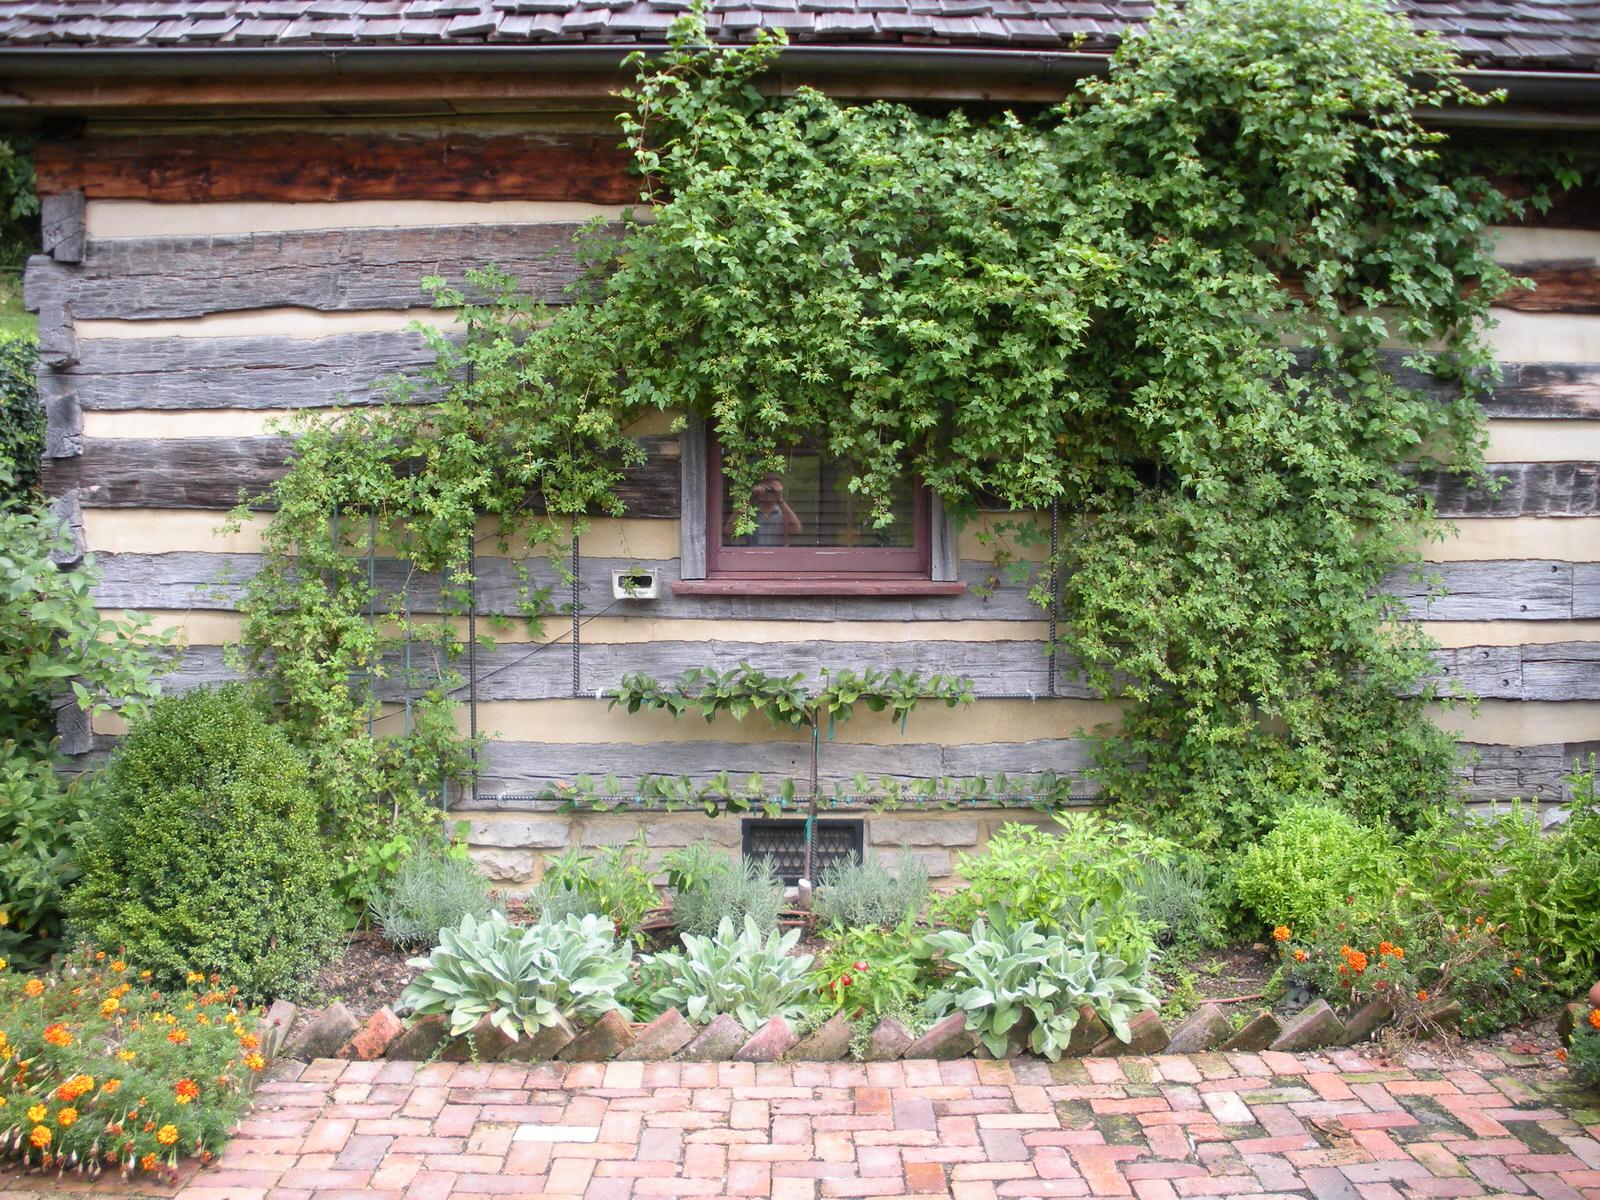 Justin Stelter Landscape Gardening - Espalier Installations - 2886257301_08d85e3a66_o.jpg